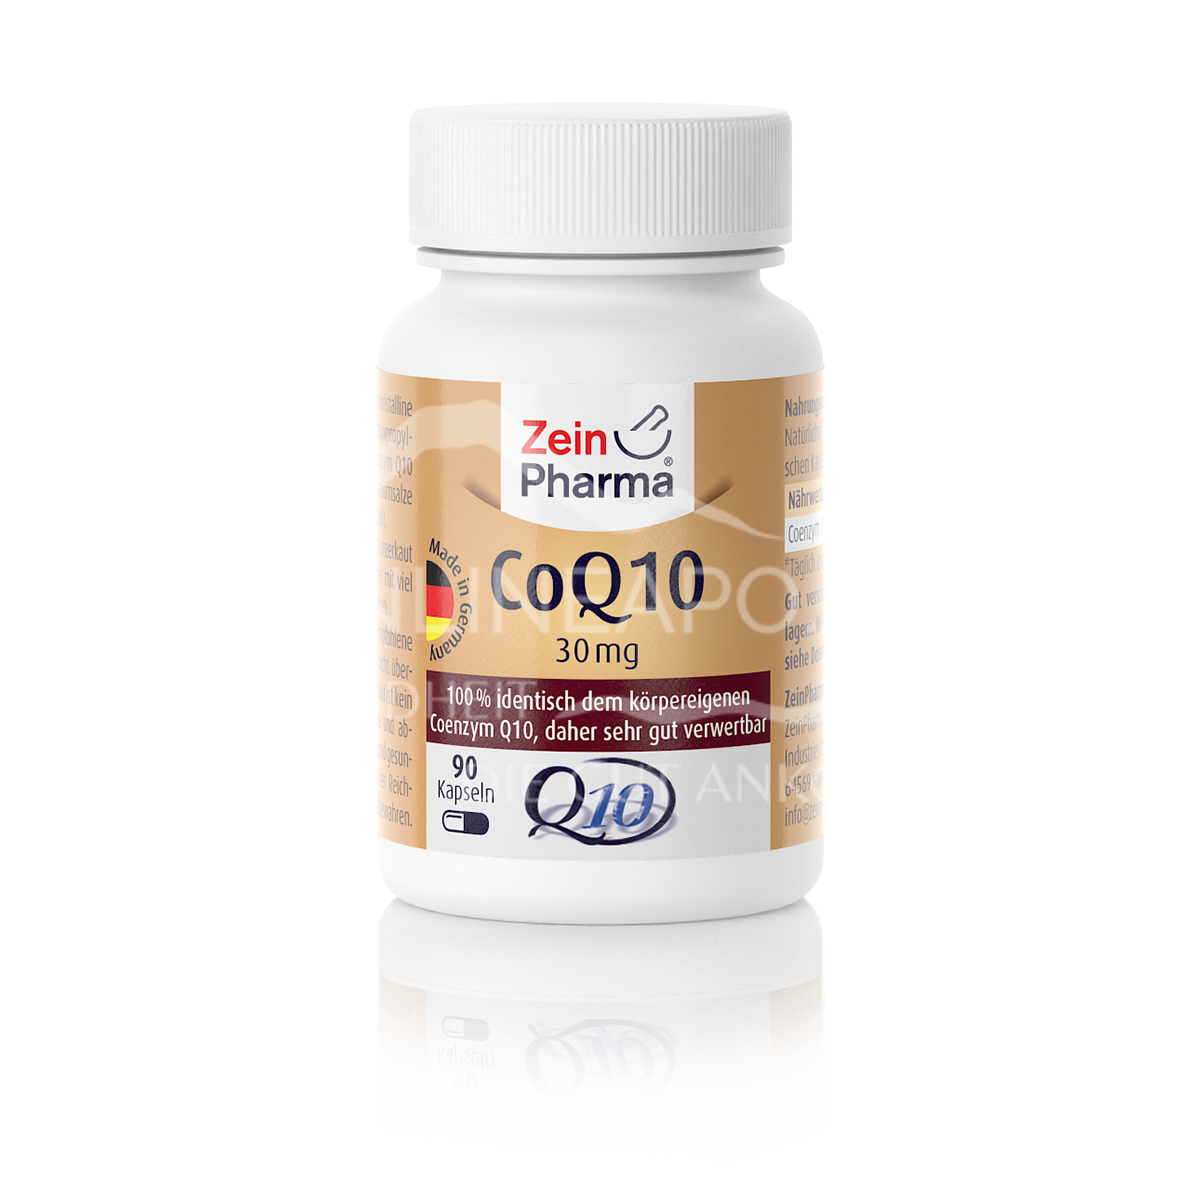 Zeinpharma Coenzym Q10 30 mg Kapseln